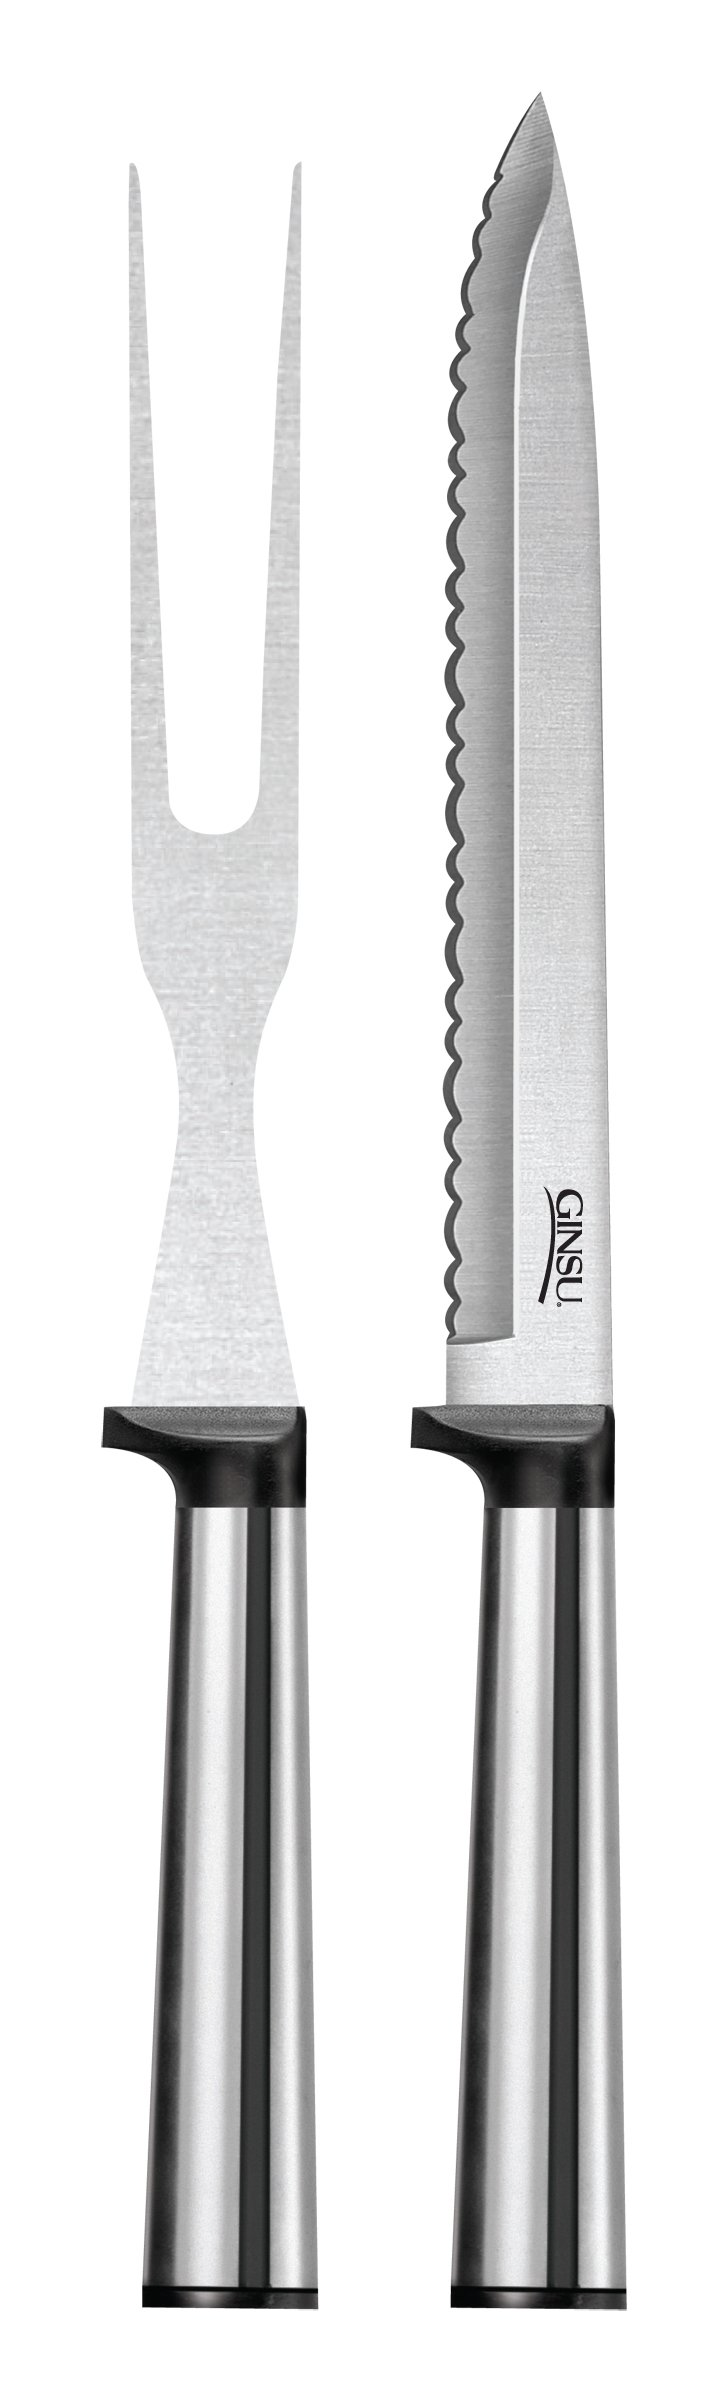 Ginsu Koden Series Stainless Steel 2-Piece Carving Knife Set – Serrated Kitchen Knife Set, GKK-SS-DS-002-3